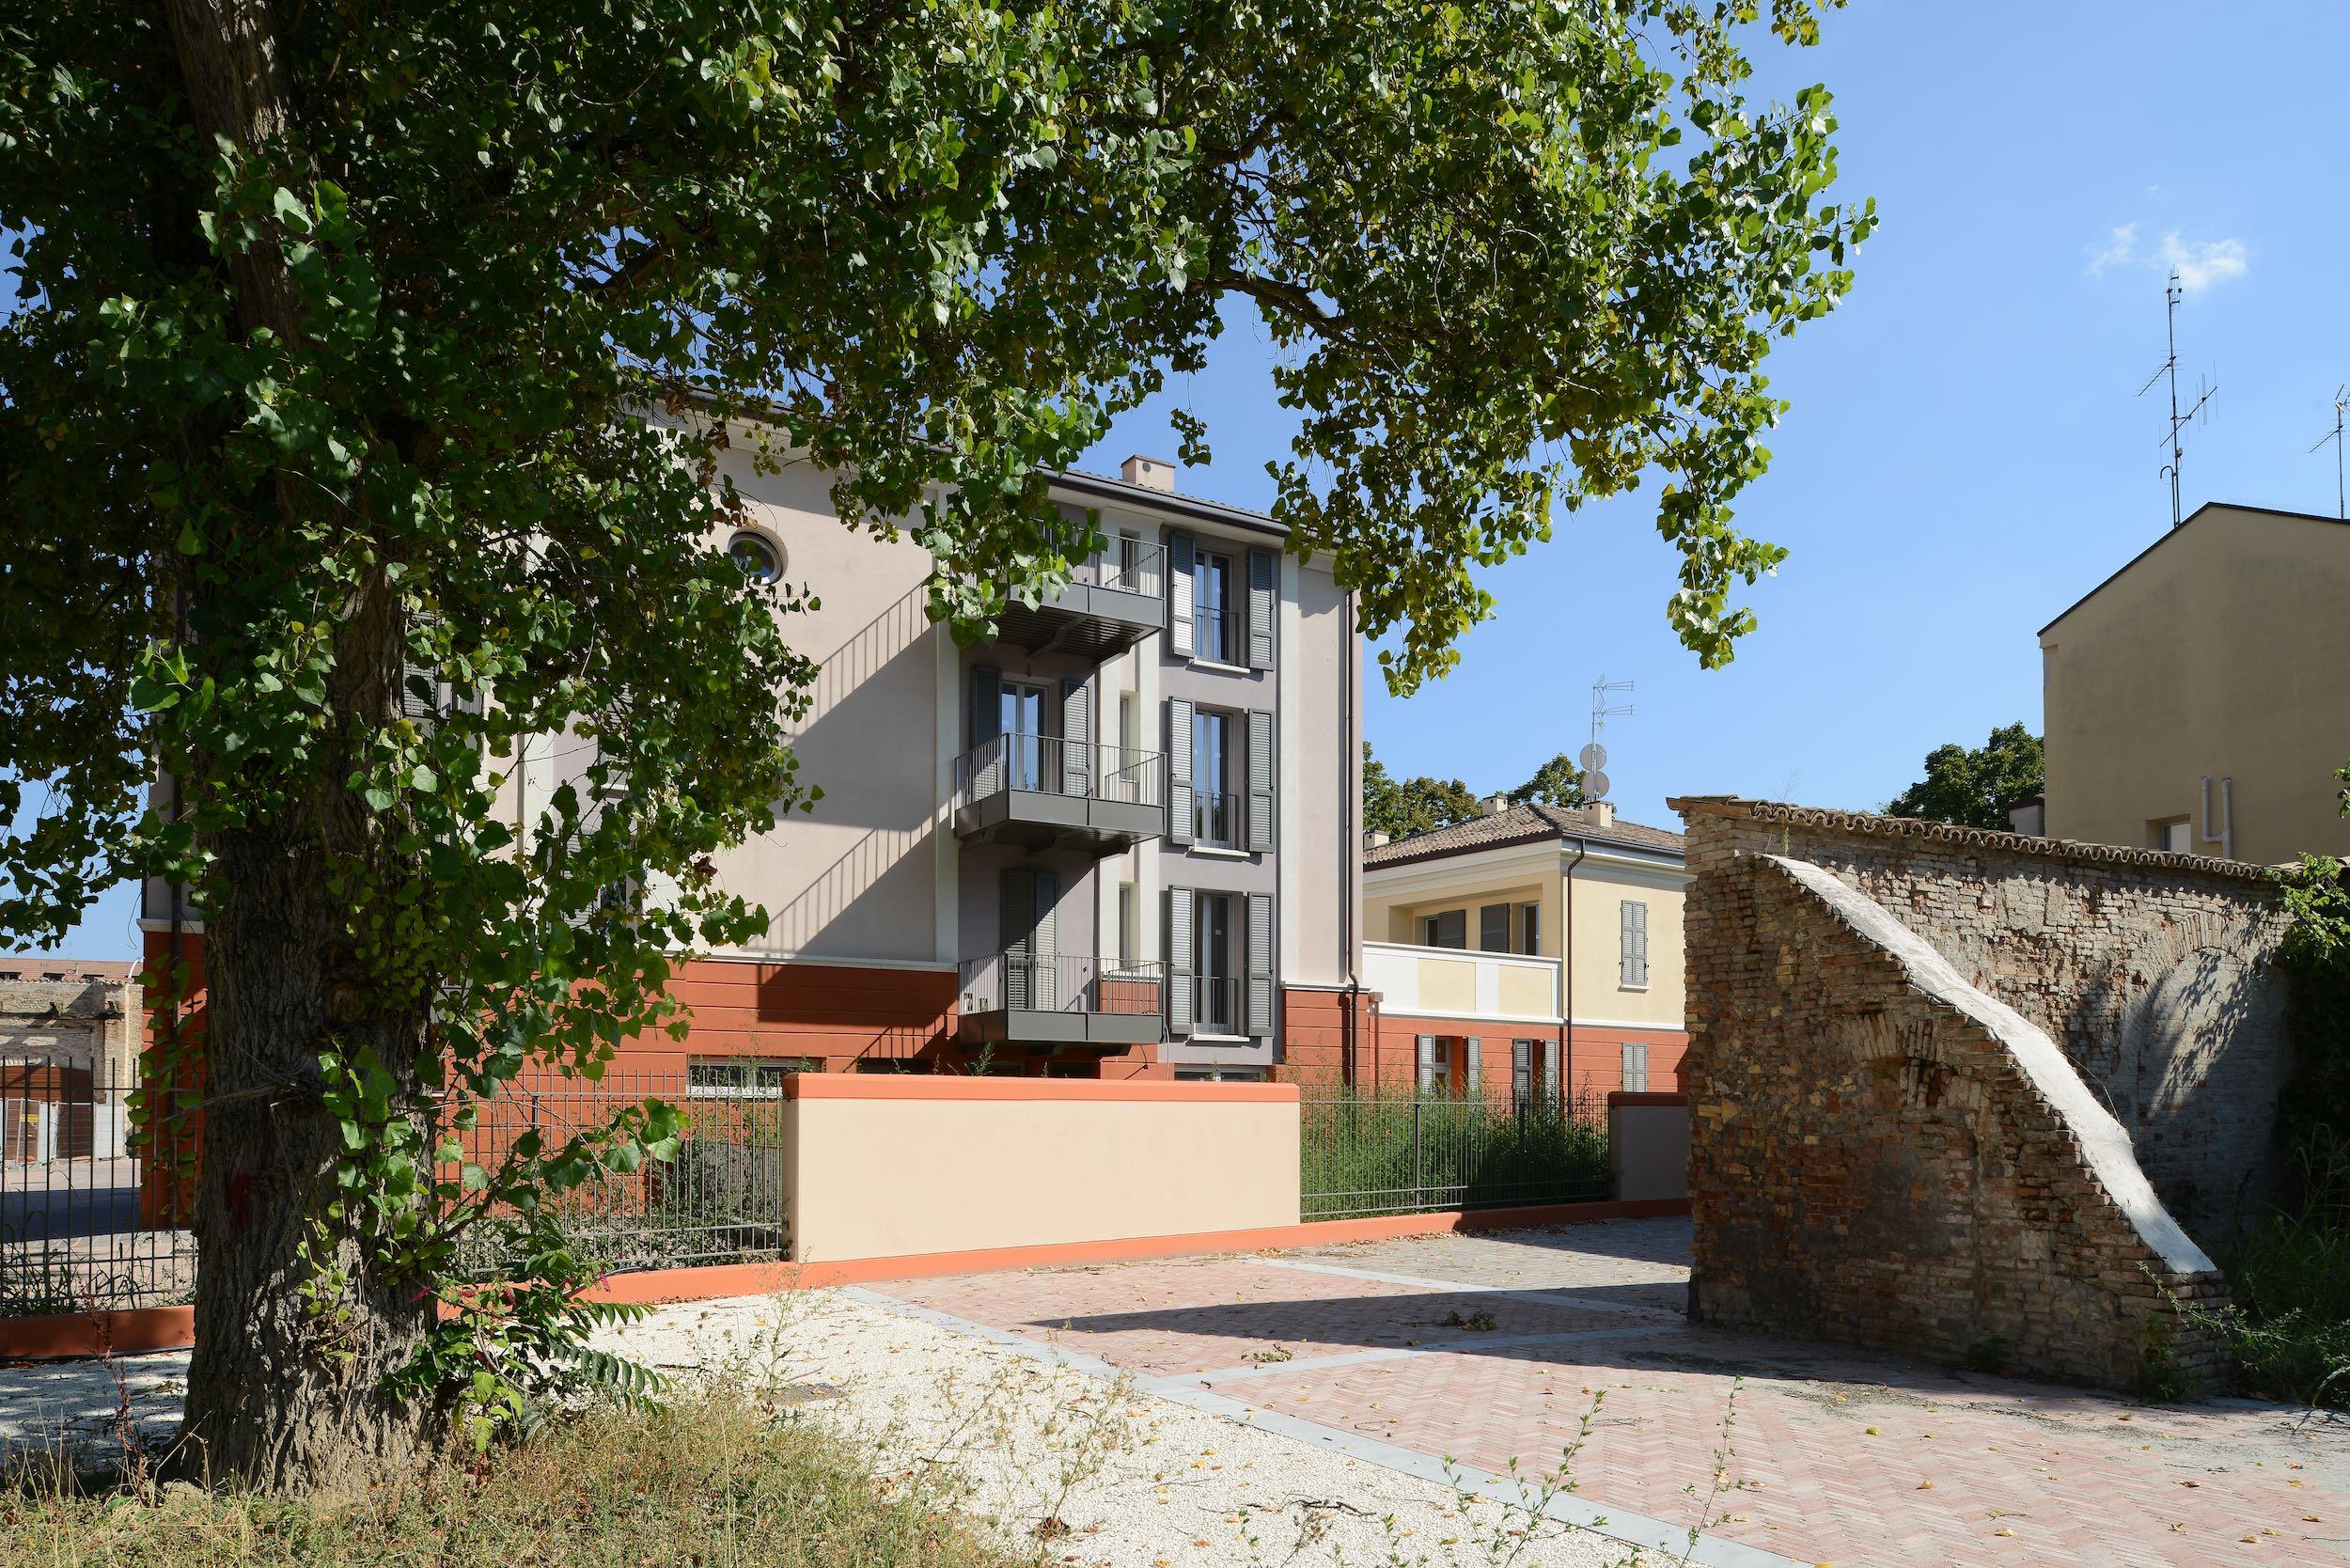 6328 Studio Bacchi Architetti Santa Chiara Residenziale